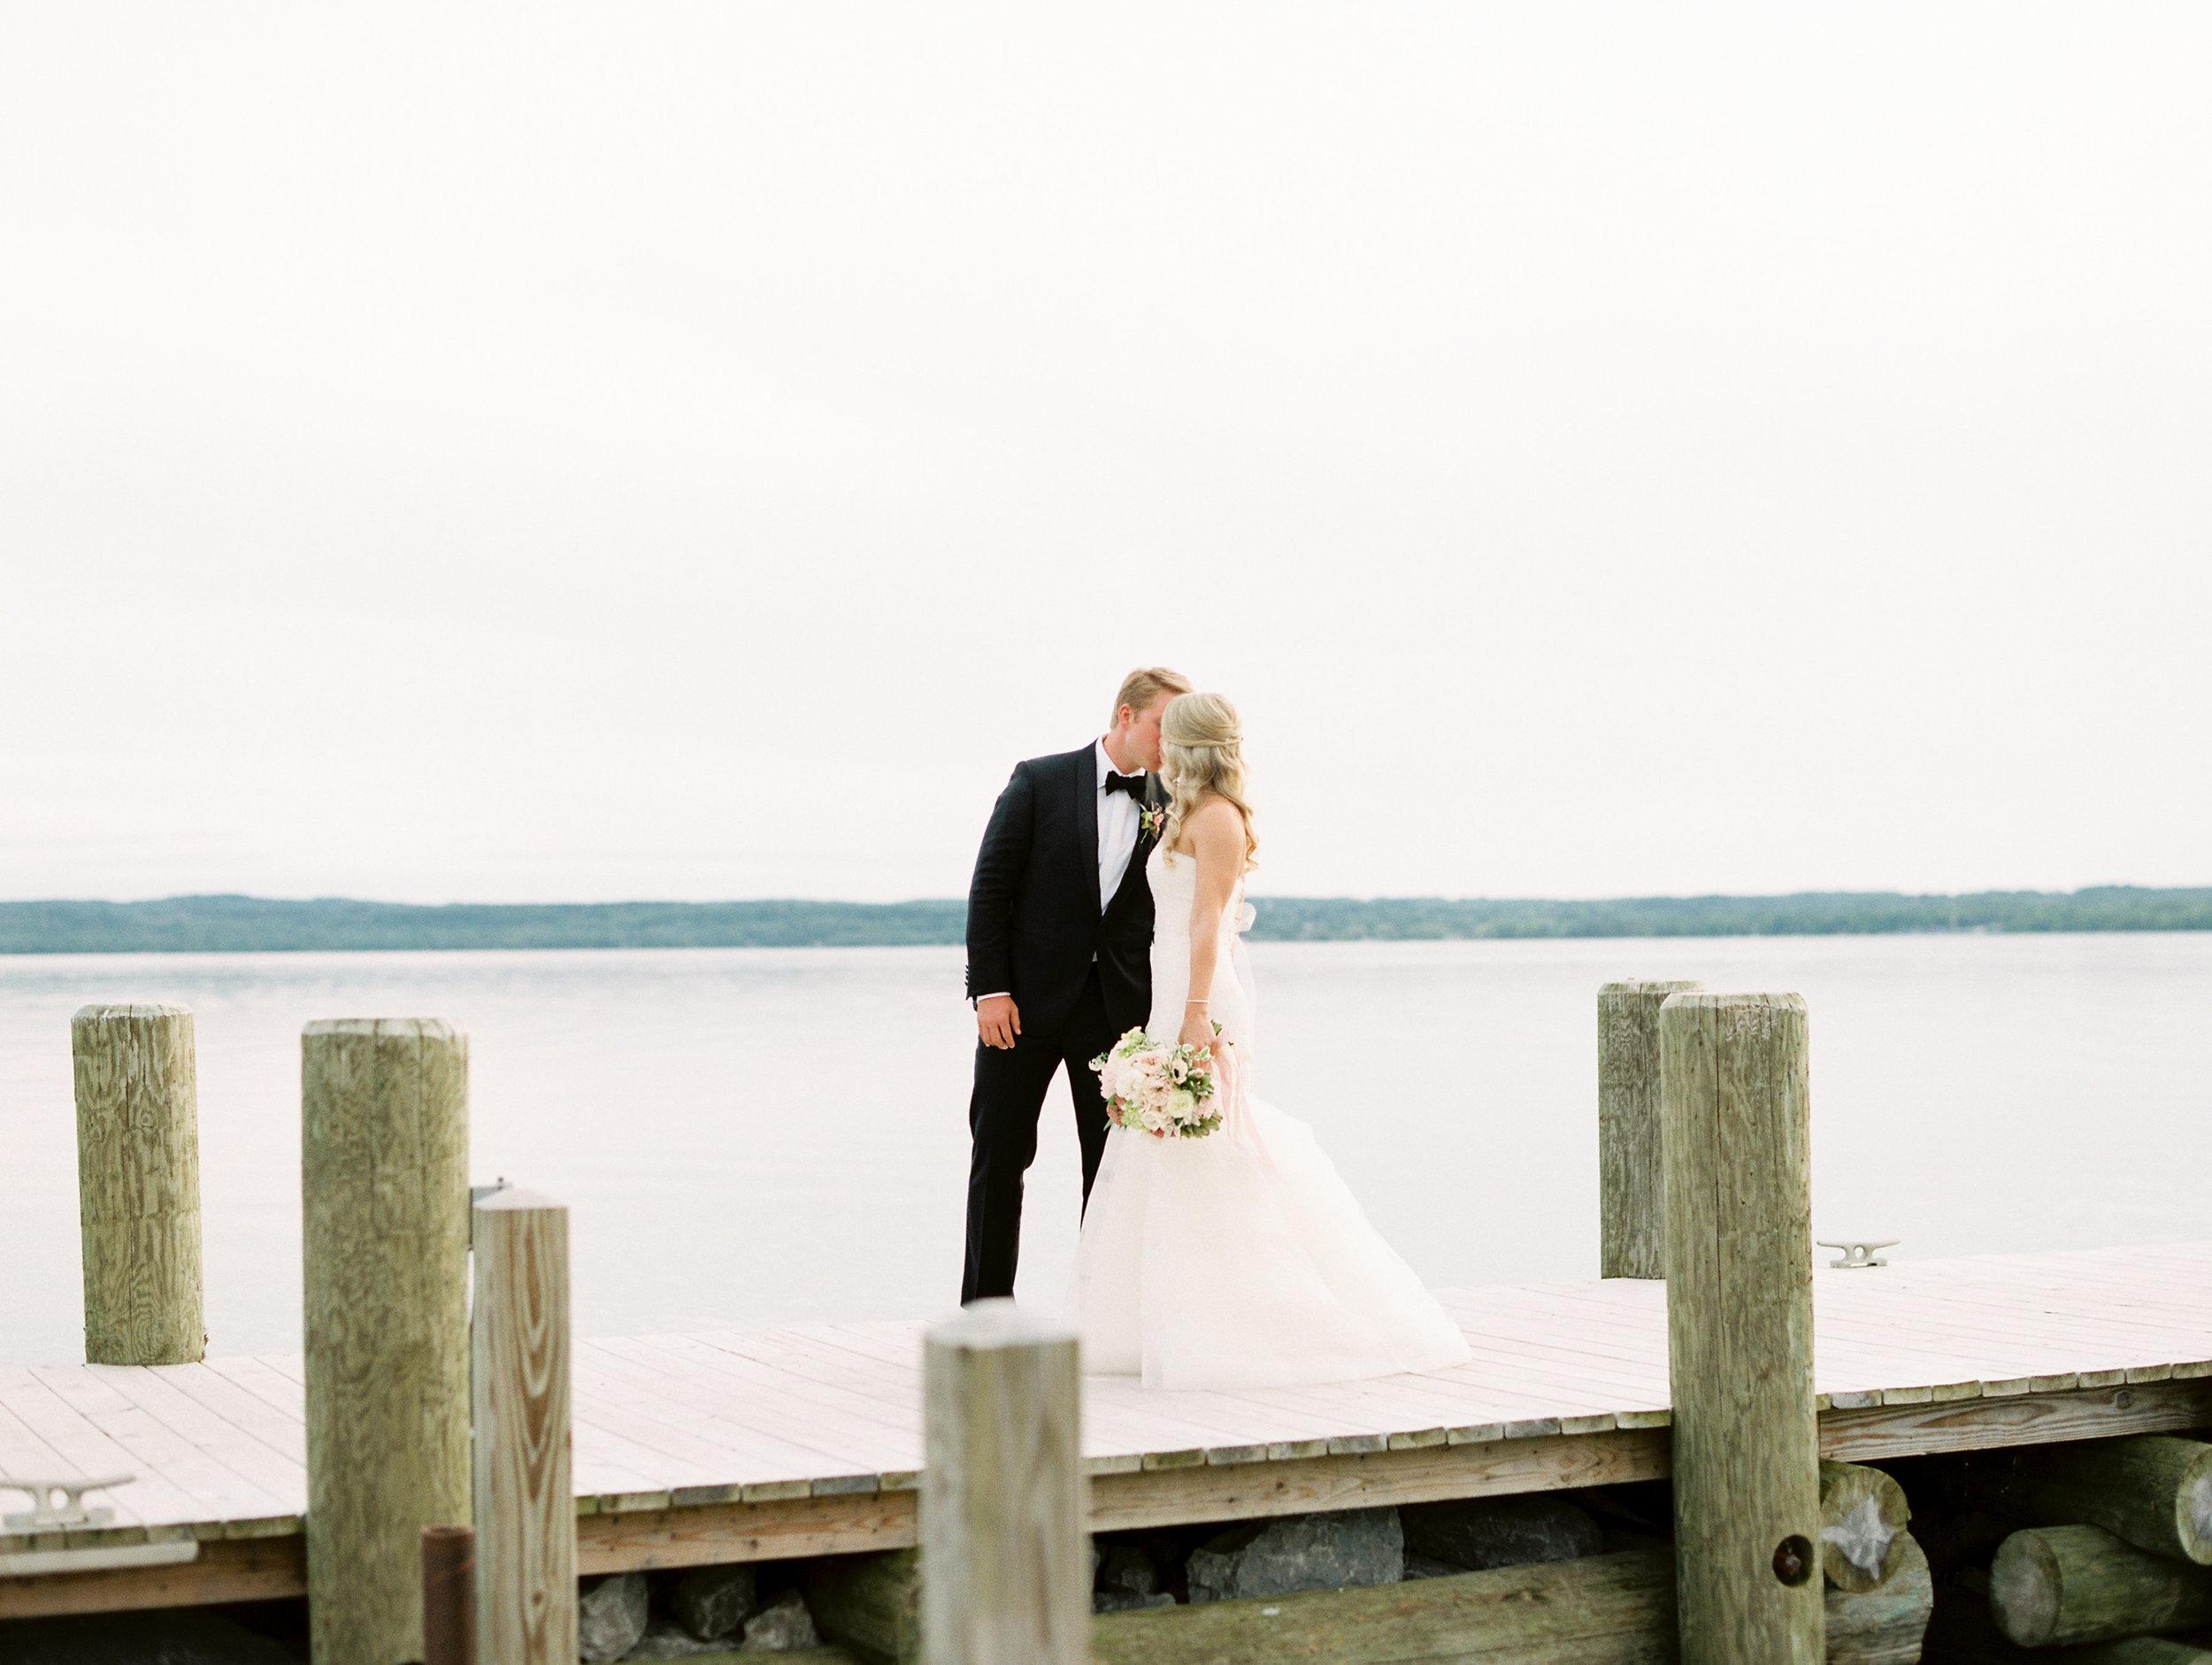 Coffman+Wedding+Bride+Groom+Sunset-80.jpg